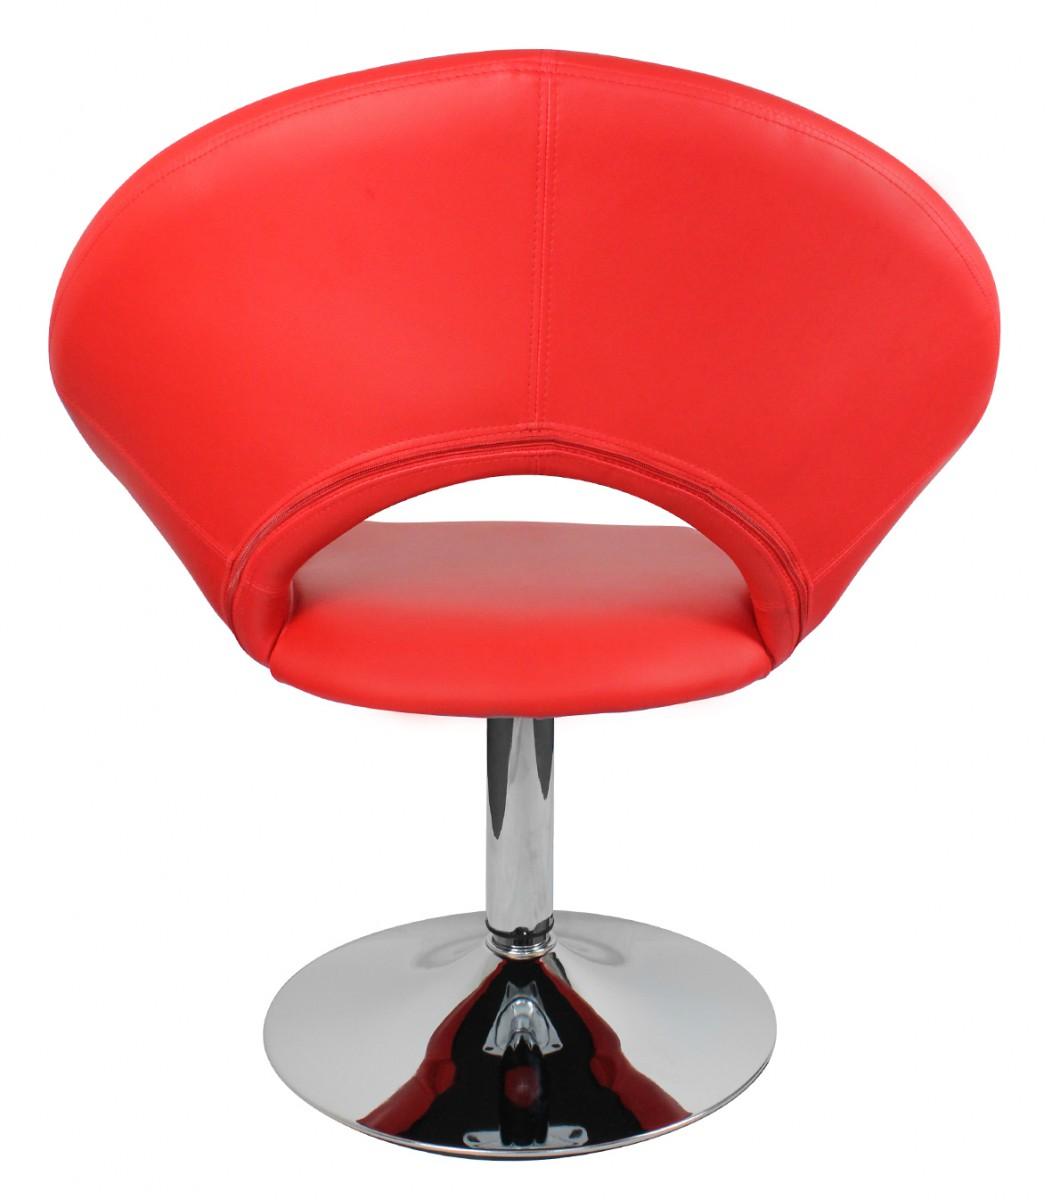 amstyle malta loungesessel leder optik rot relaxsessel. Black Bedroom Furniture Sets. Home Design Ideas